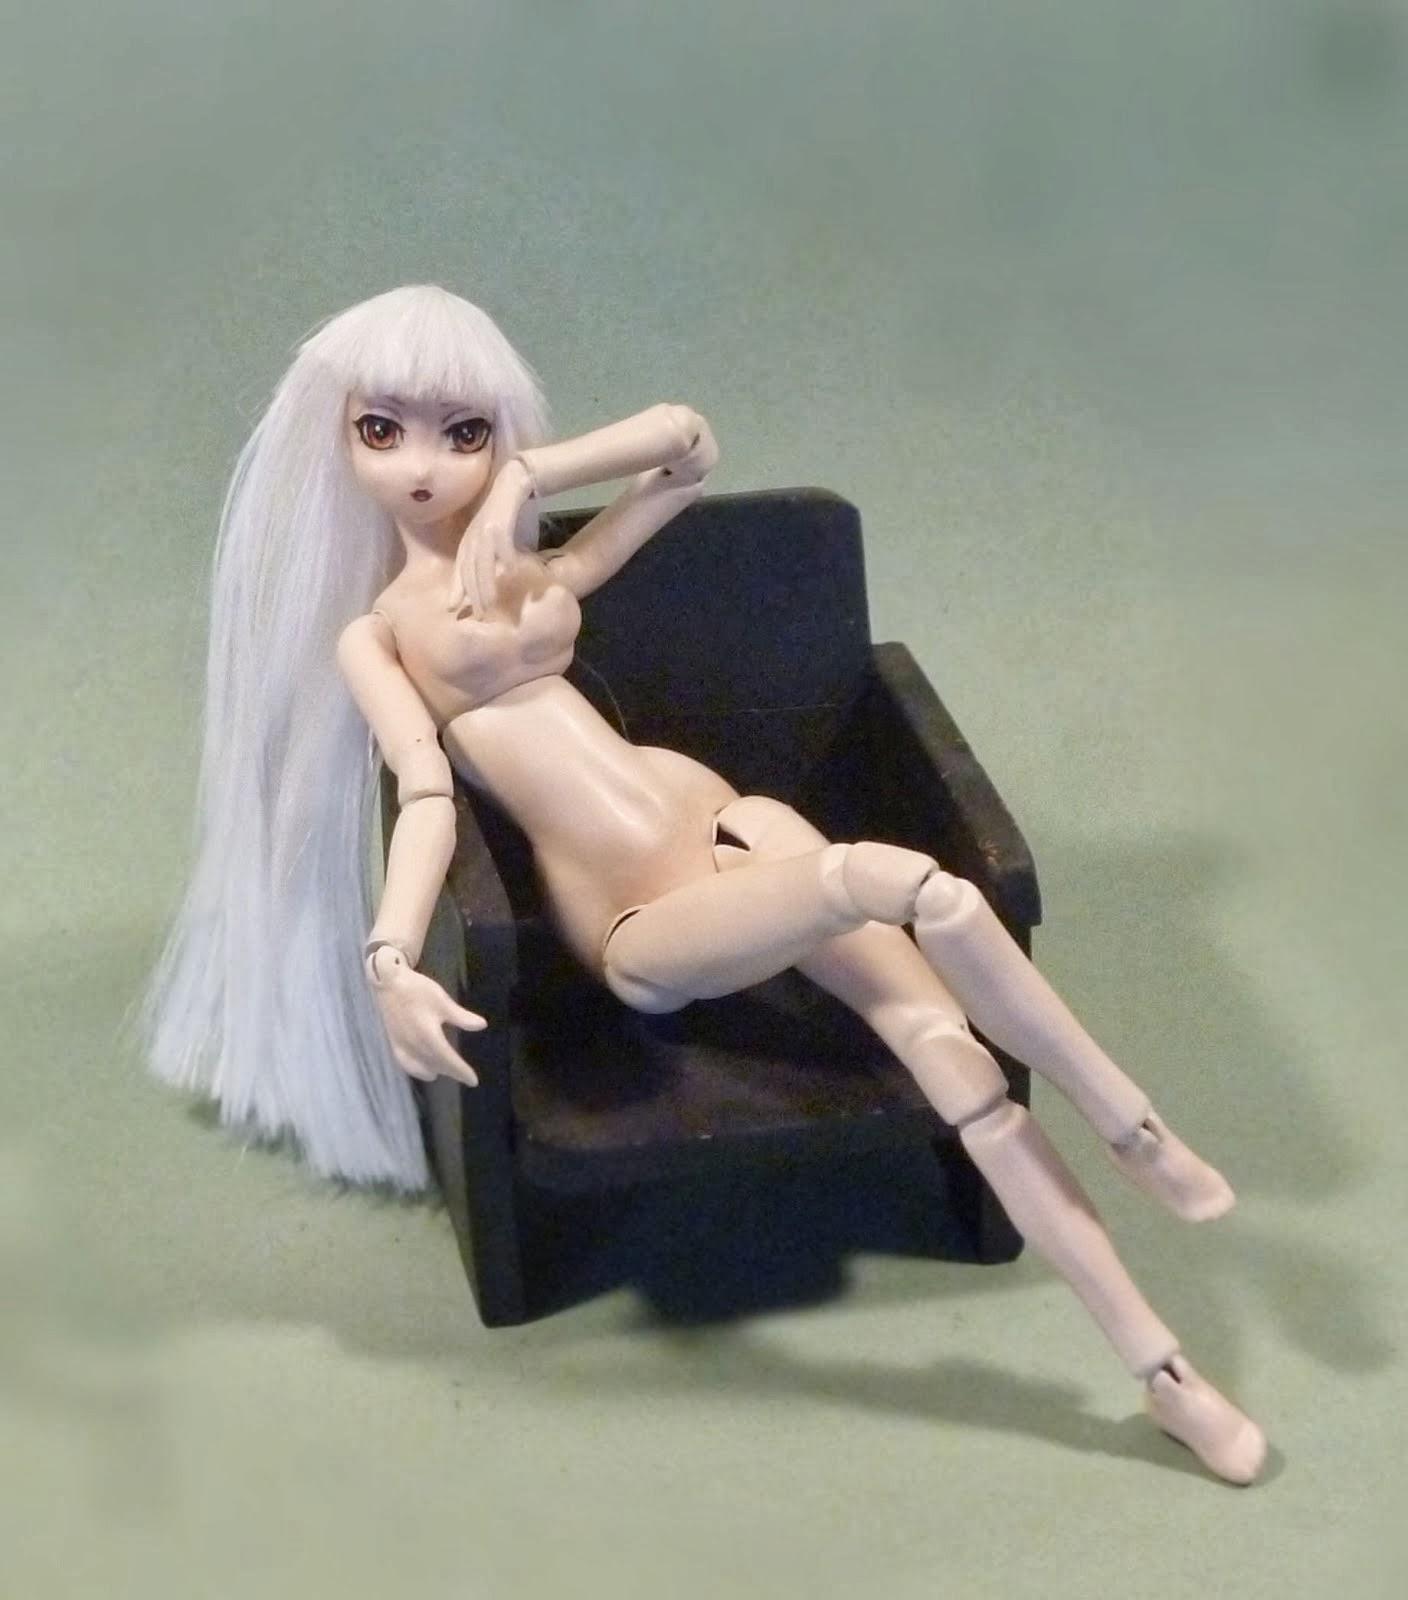 Muñeca estilo anime